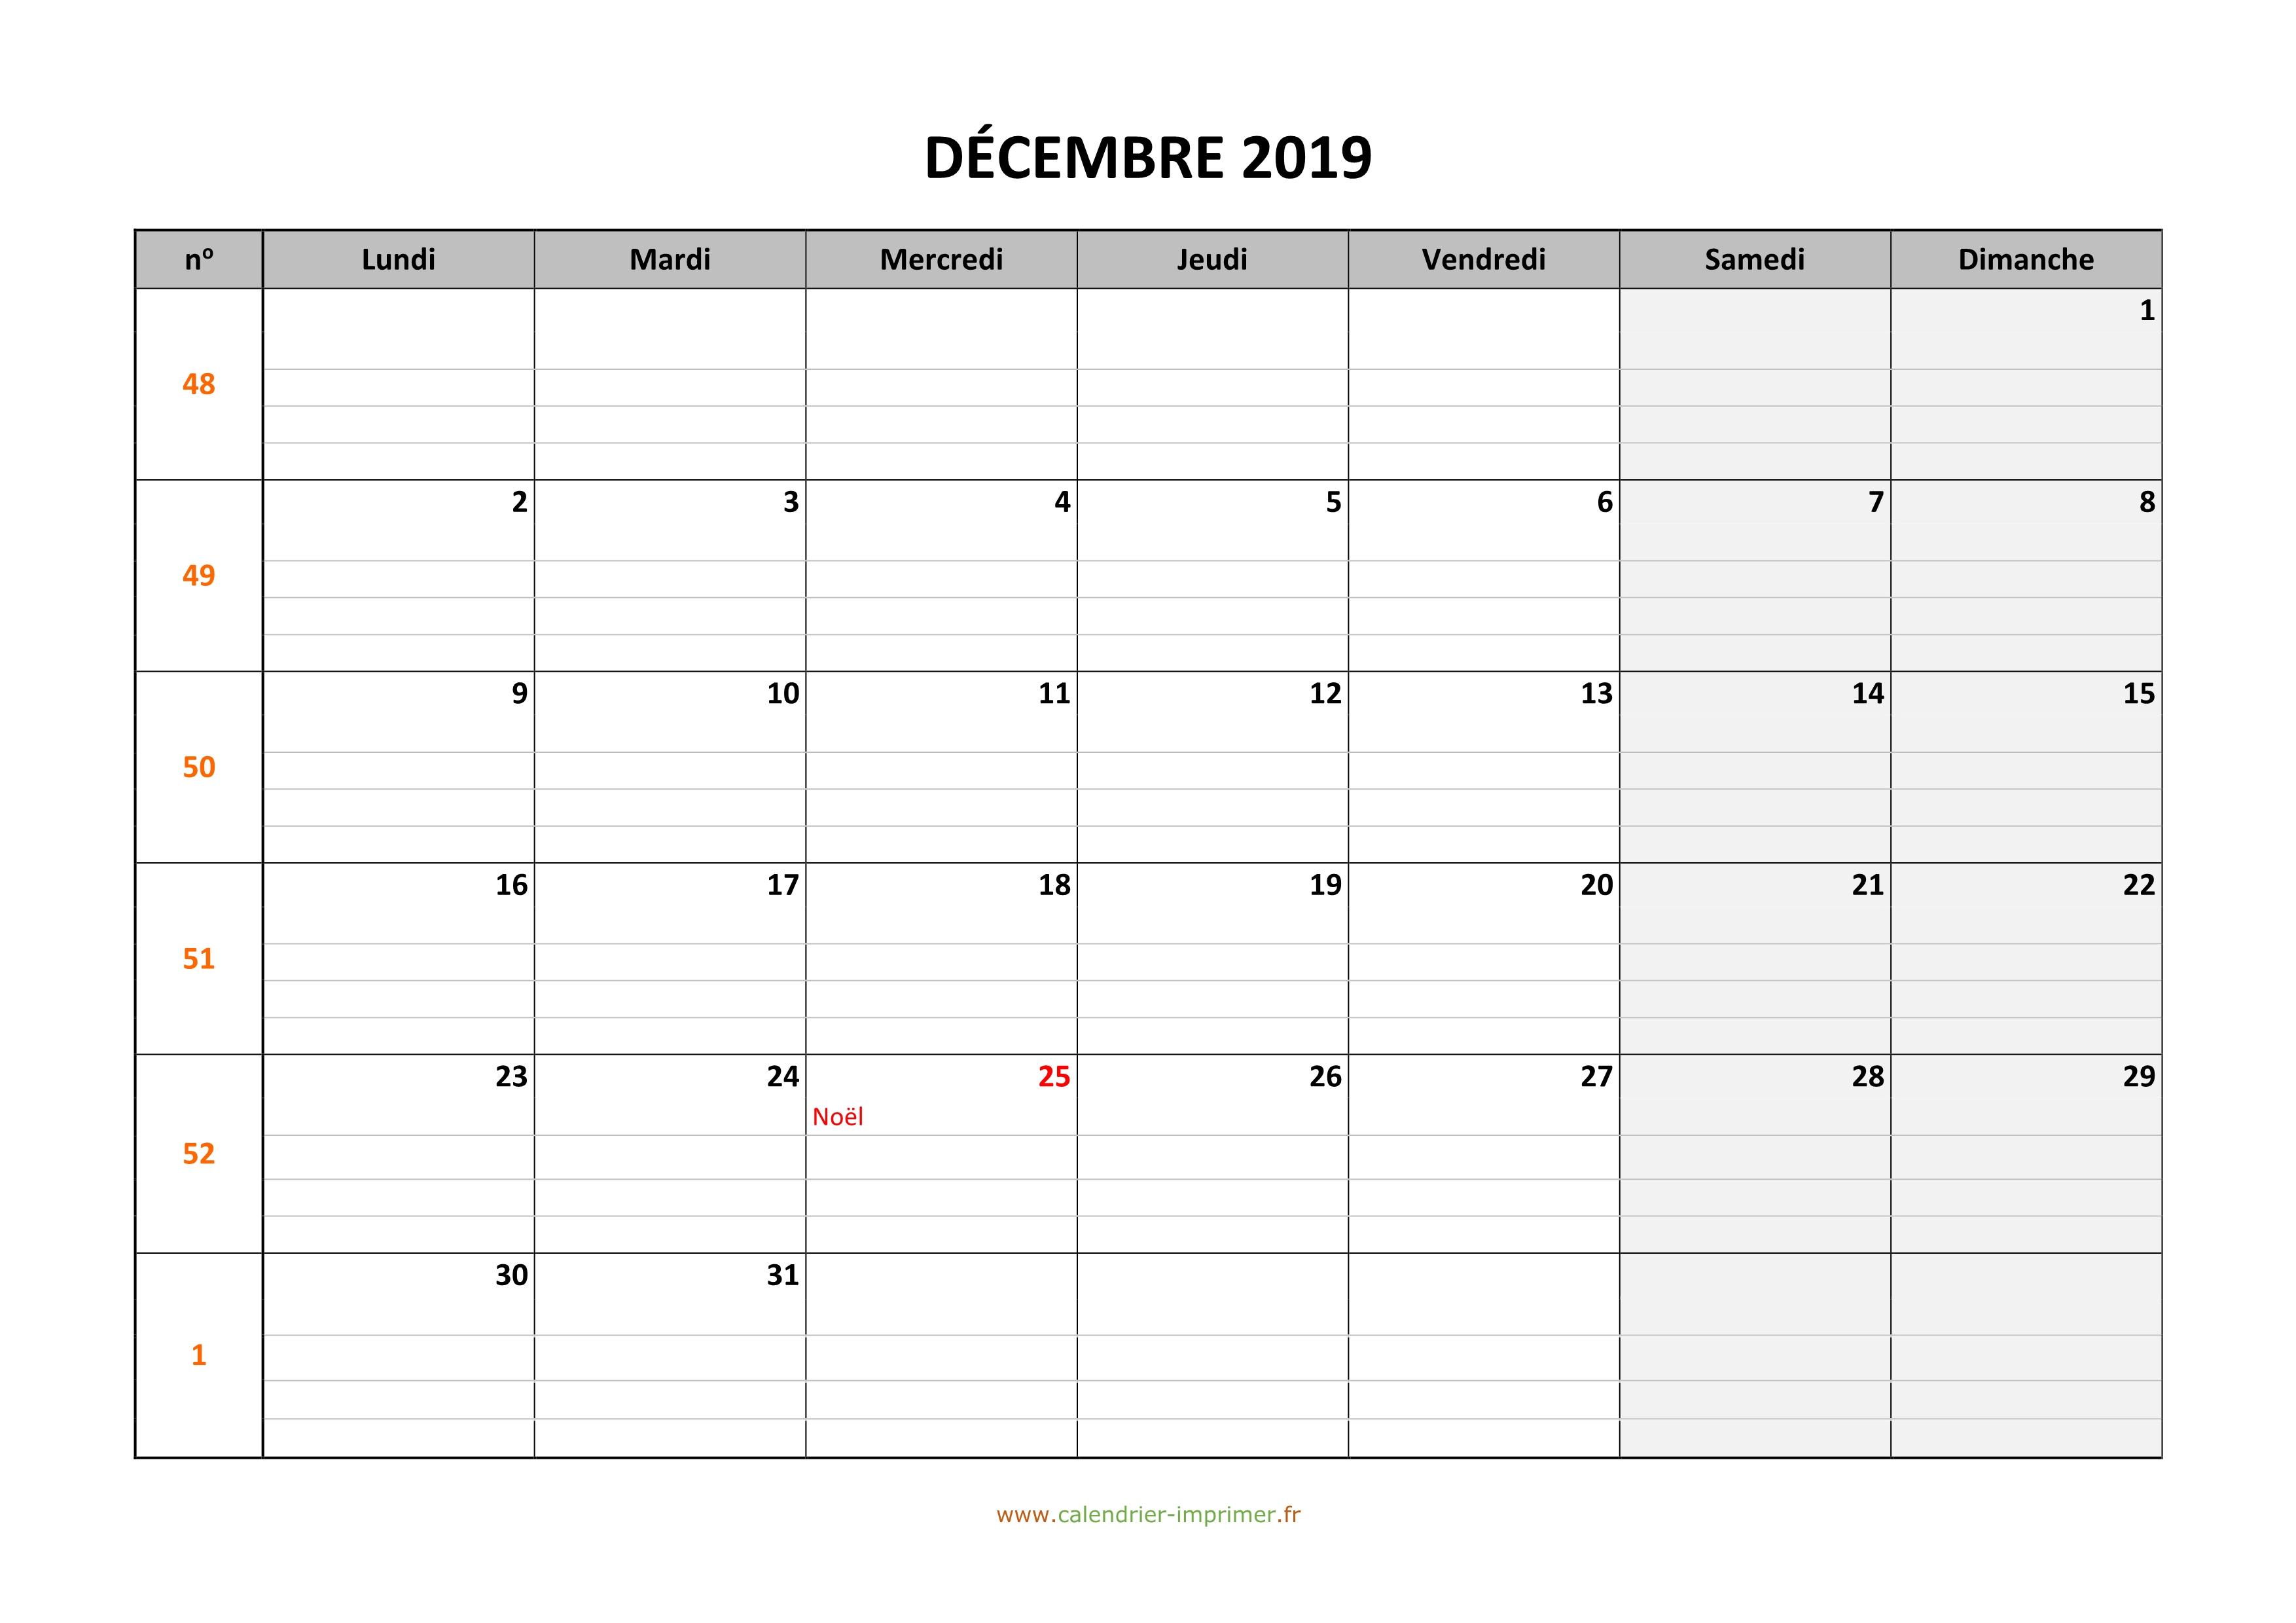 Calendrier Mensuel Decembre 2019.Calendrier Decembre 2019 A Imprimer